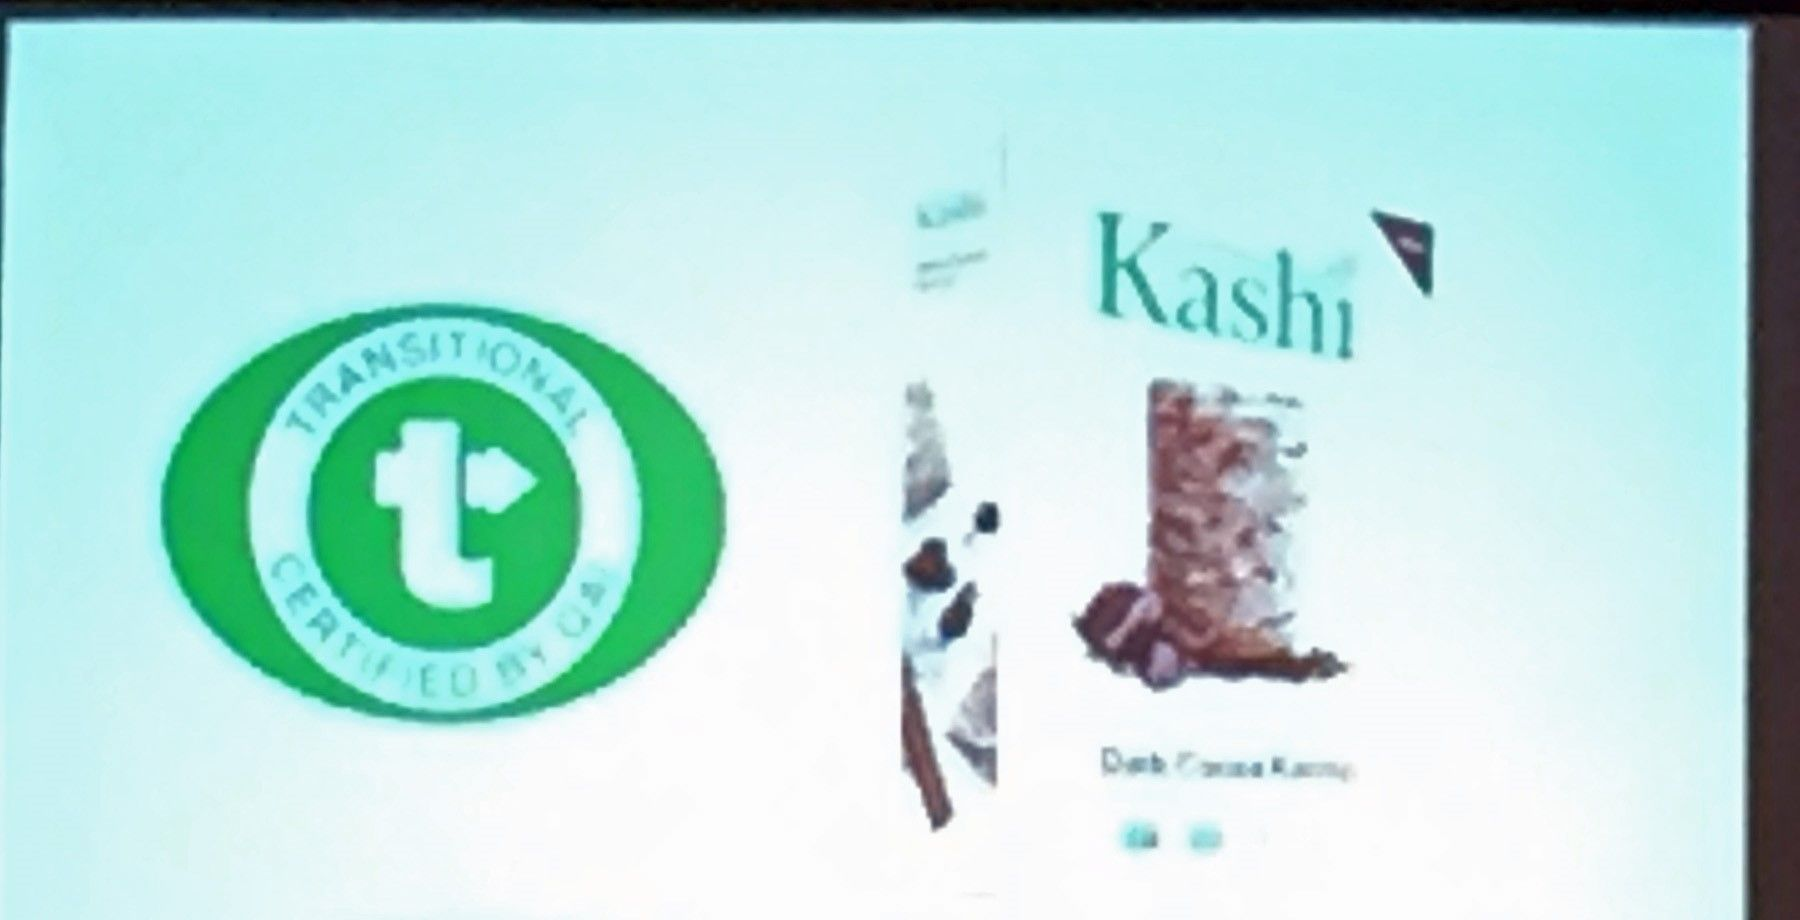 Kashi Foods and Transitional Organic Farming